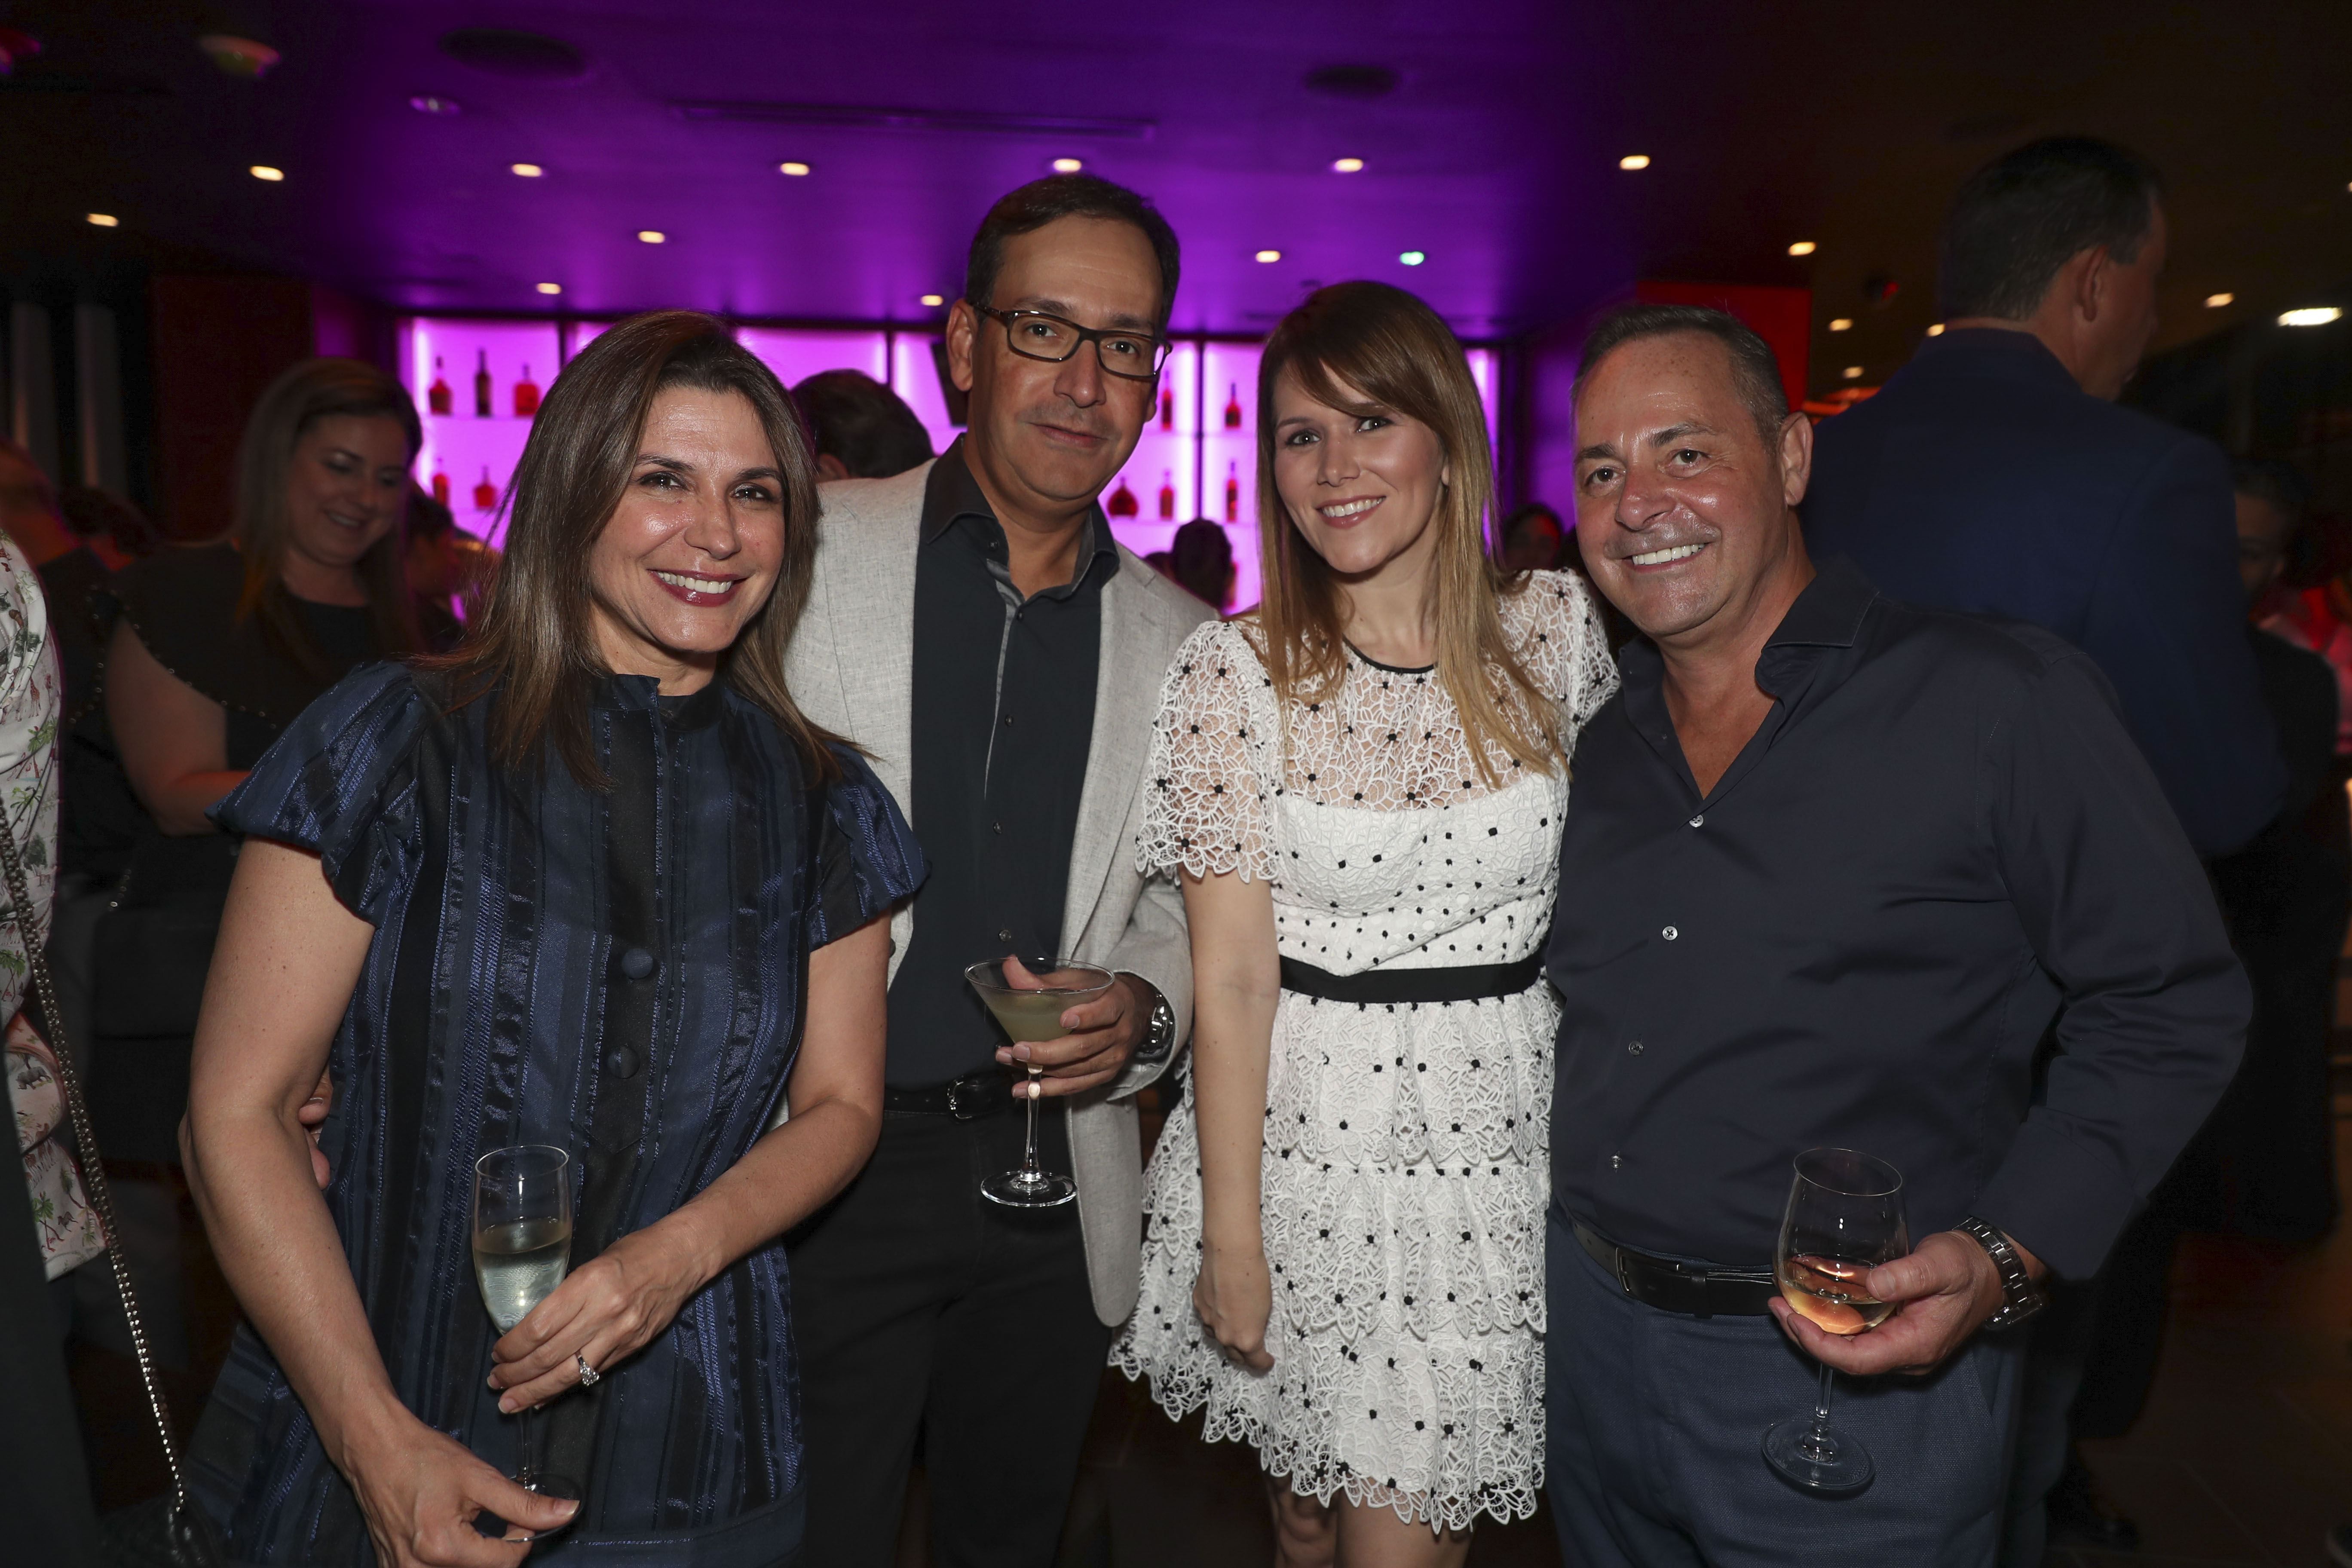 Tutti Muñoz, Javier Aponte, Dominique Myatt y Albert Charbonneau. (Suministrada)